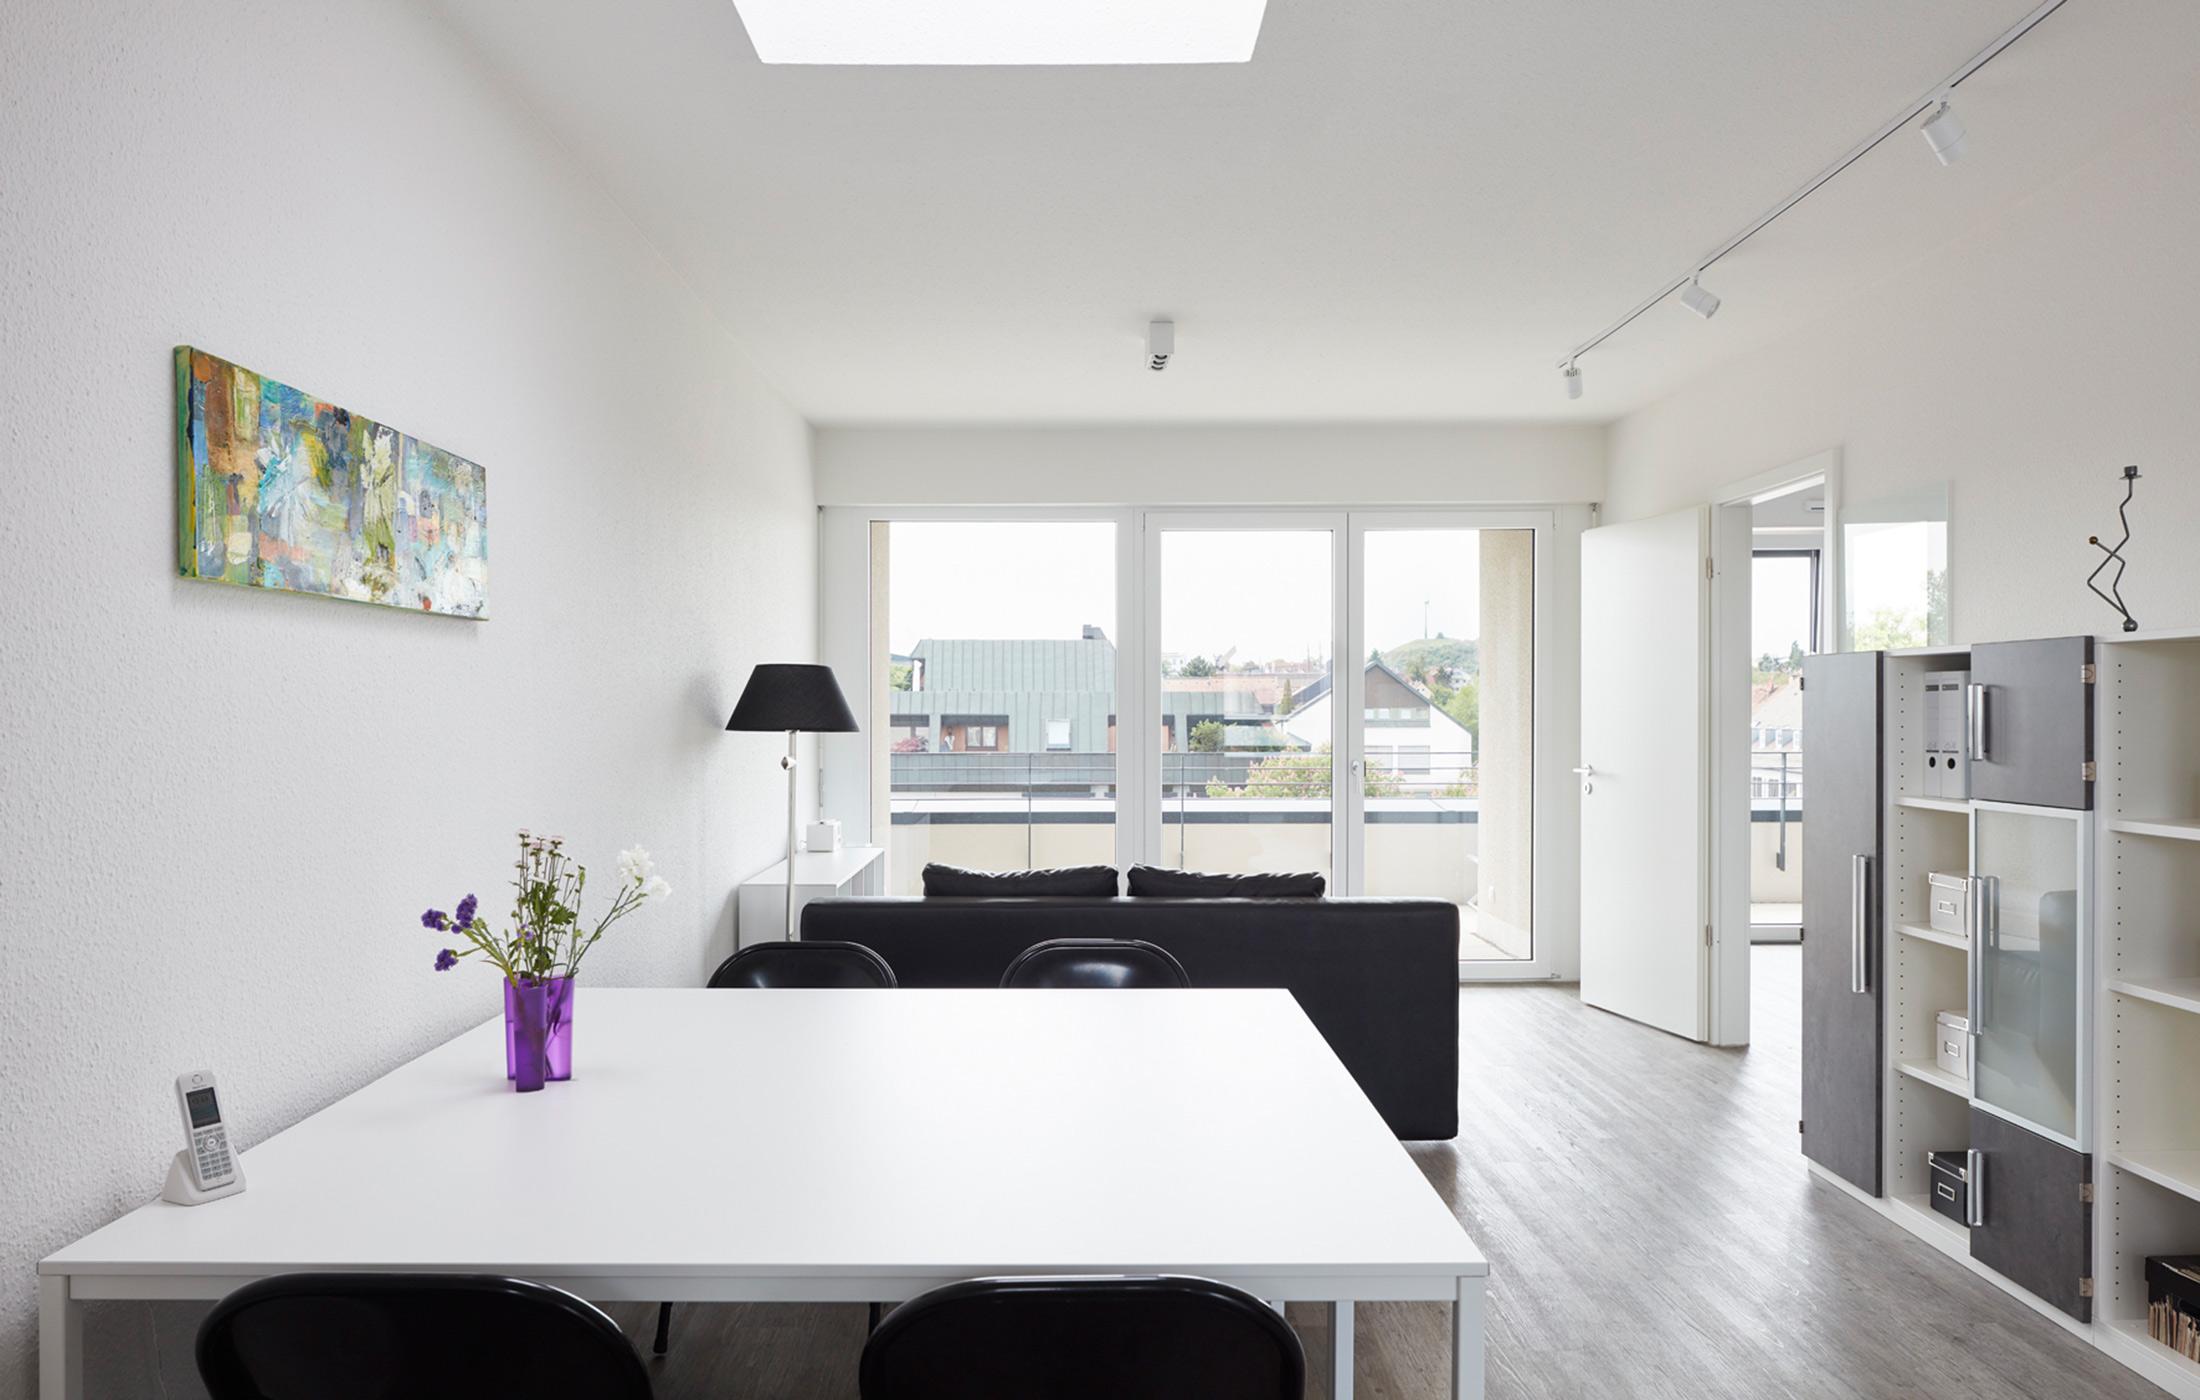 2017_Neubau_Wohnungsbau_Generalplanung_Koroneo_Korntal_Einzelhandel